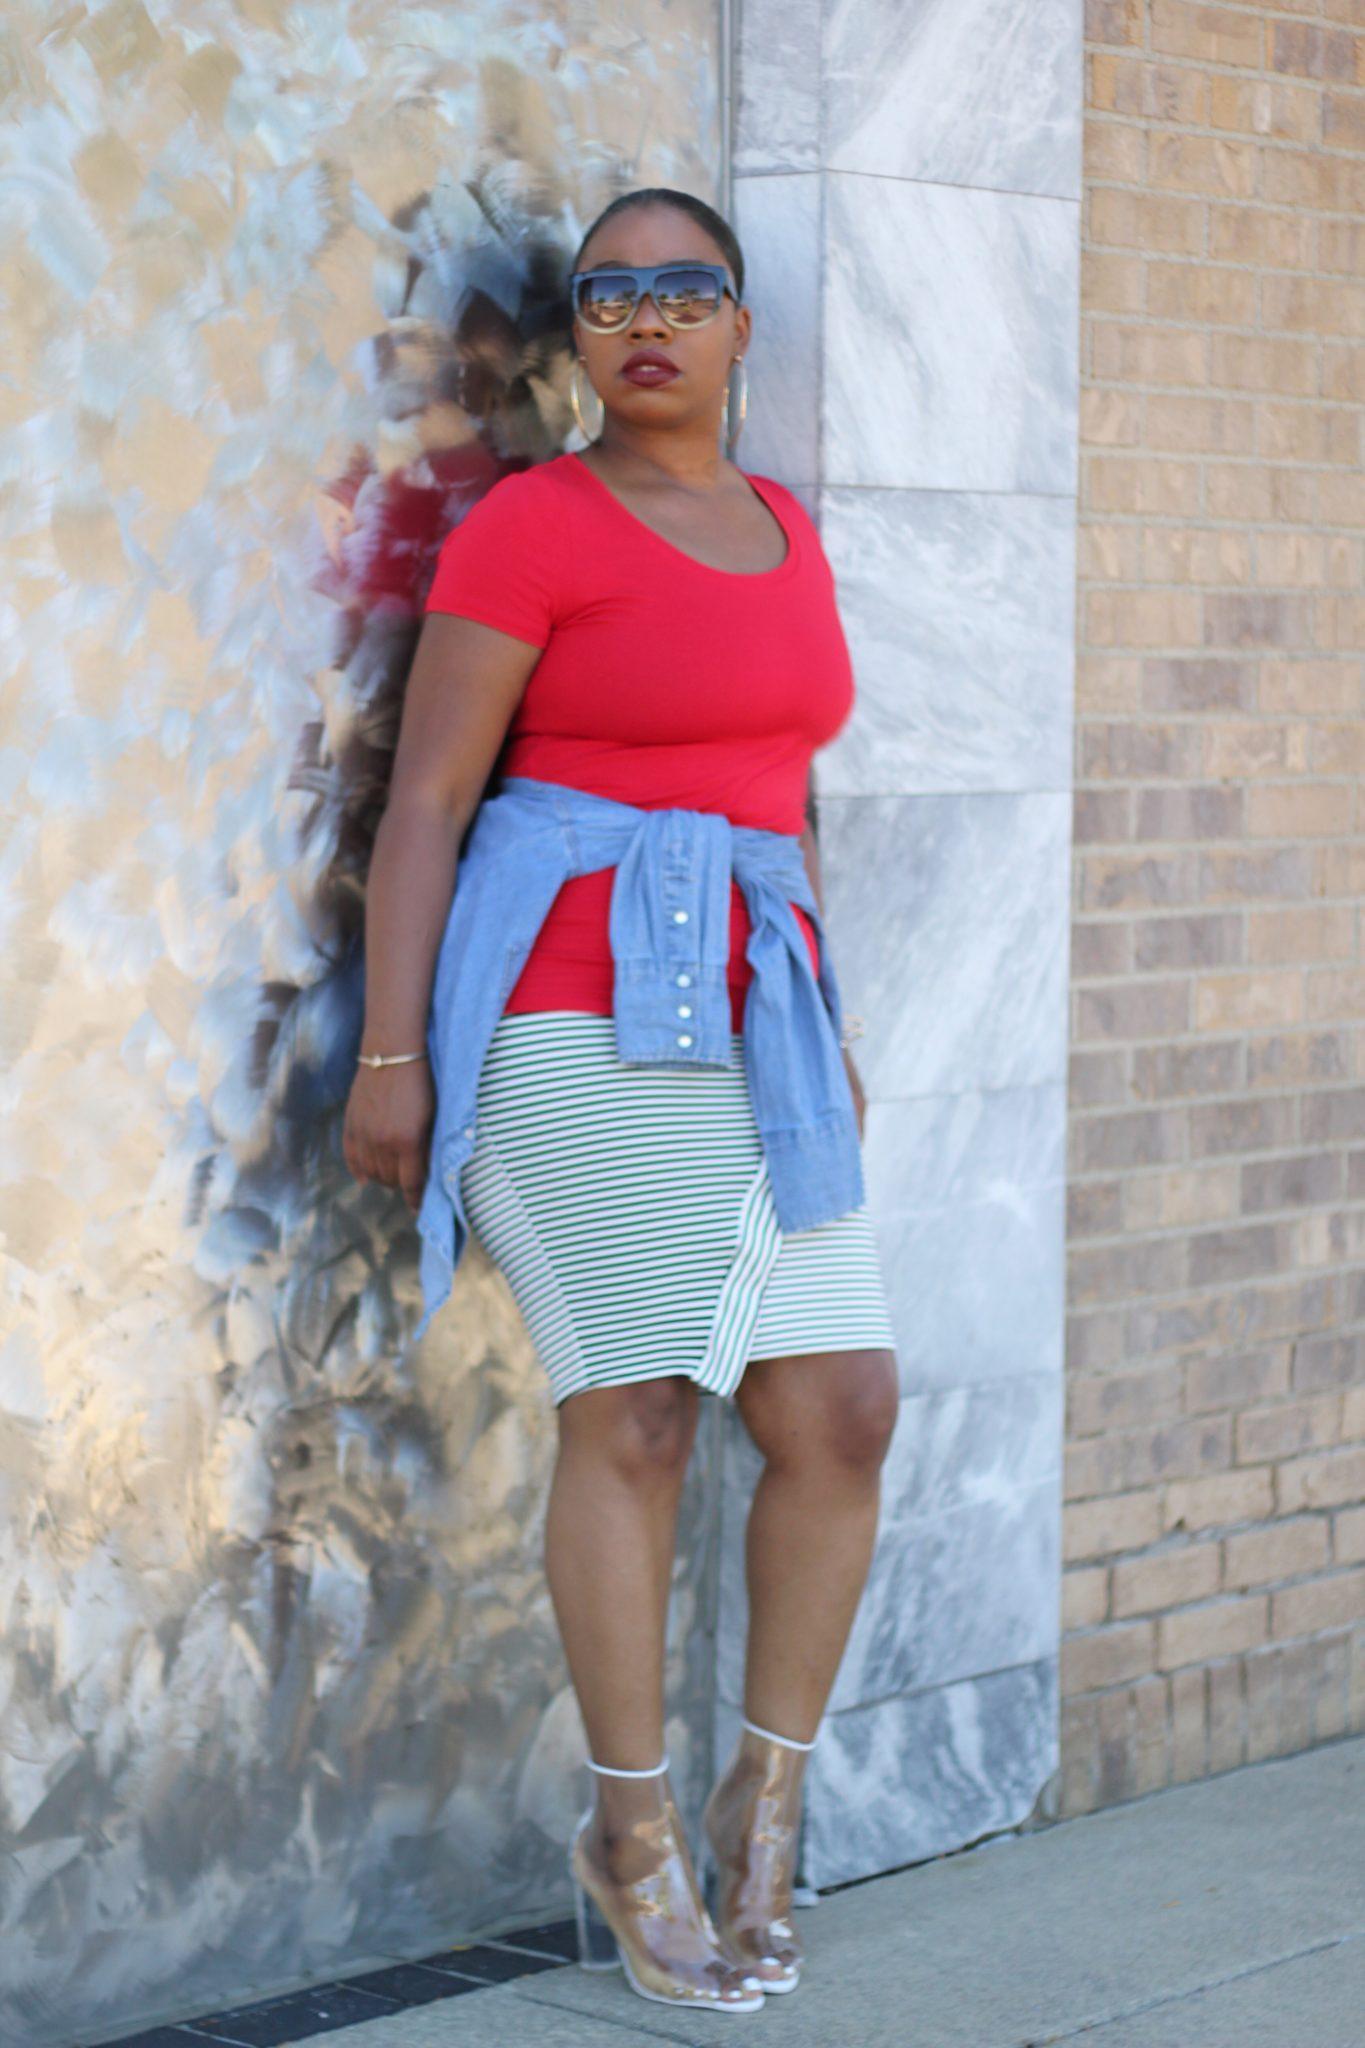 publish_snapshot-7 Classic Closet RerunsAsos Fashion Jennie Ellen OOTD Uncategorized